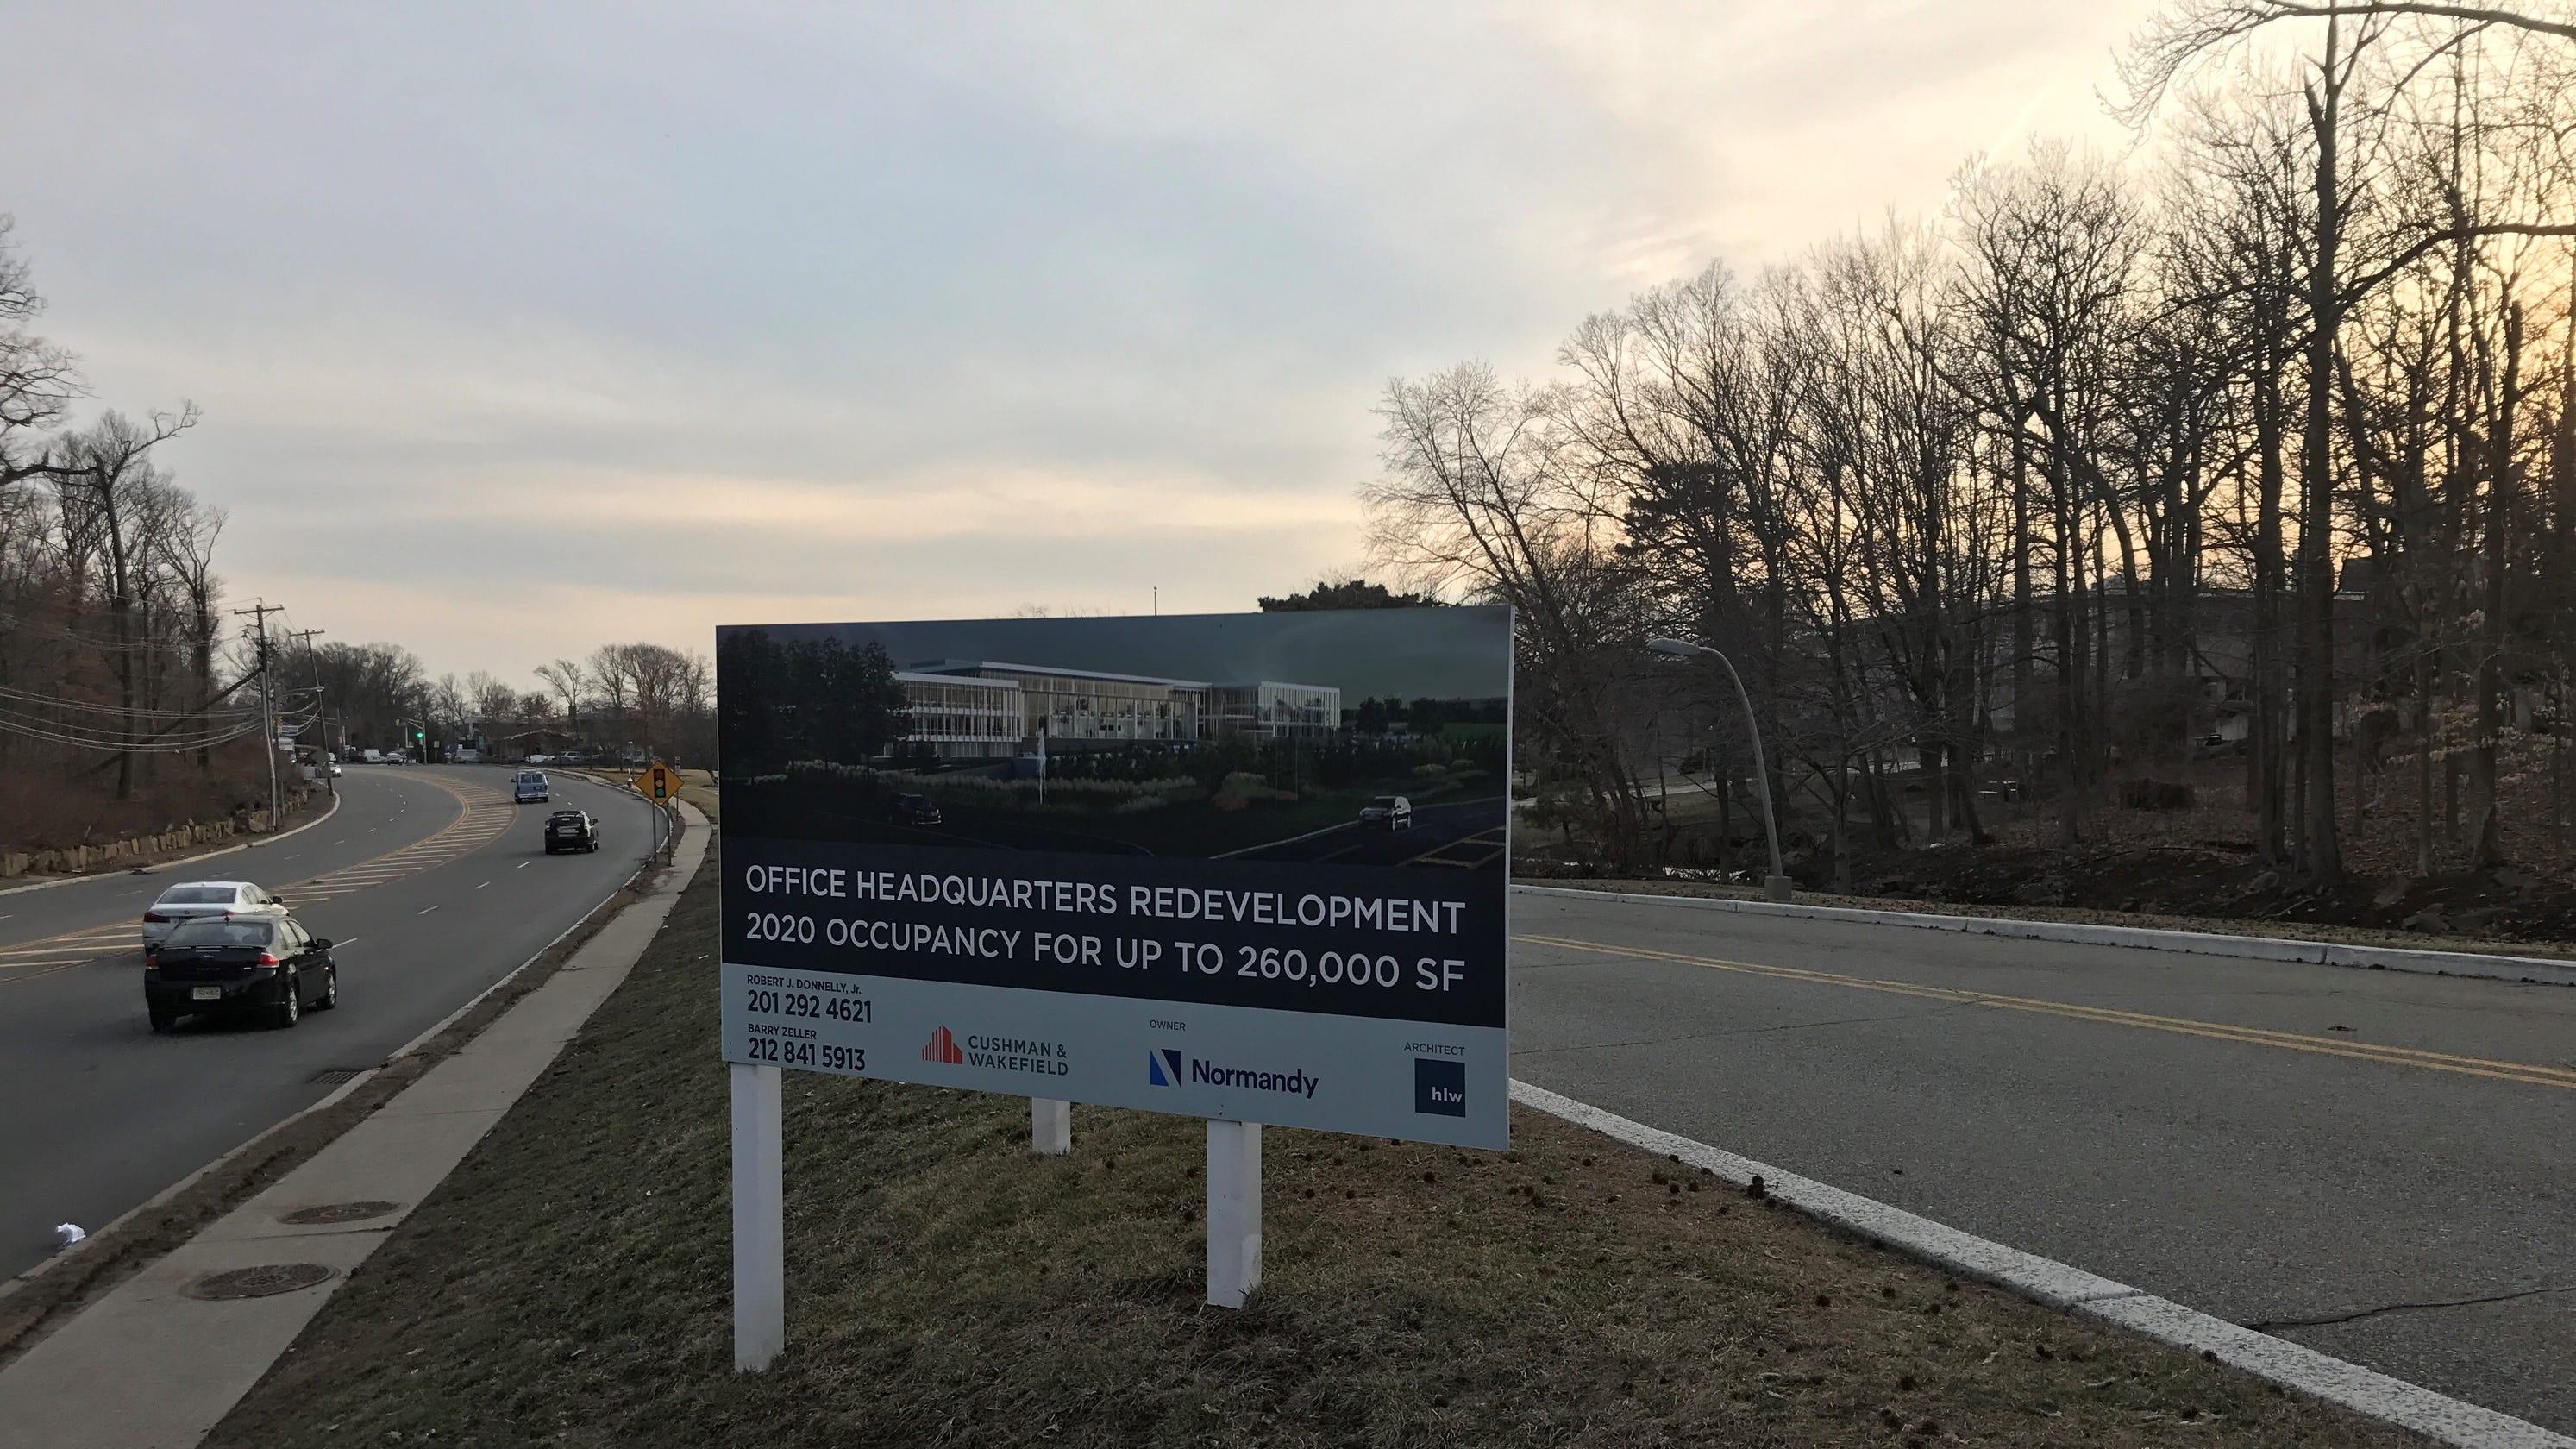 Englewood Cliffs NJ mayor calls affordable housing